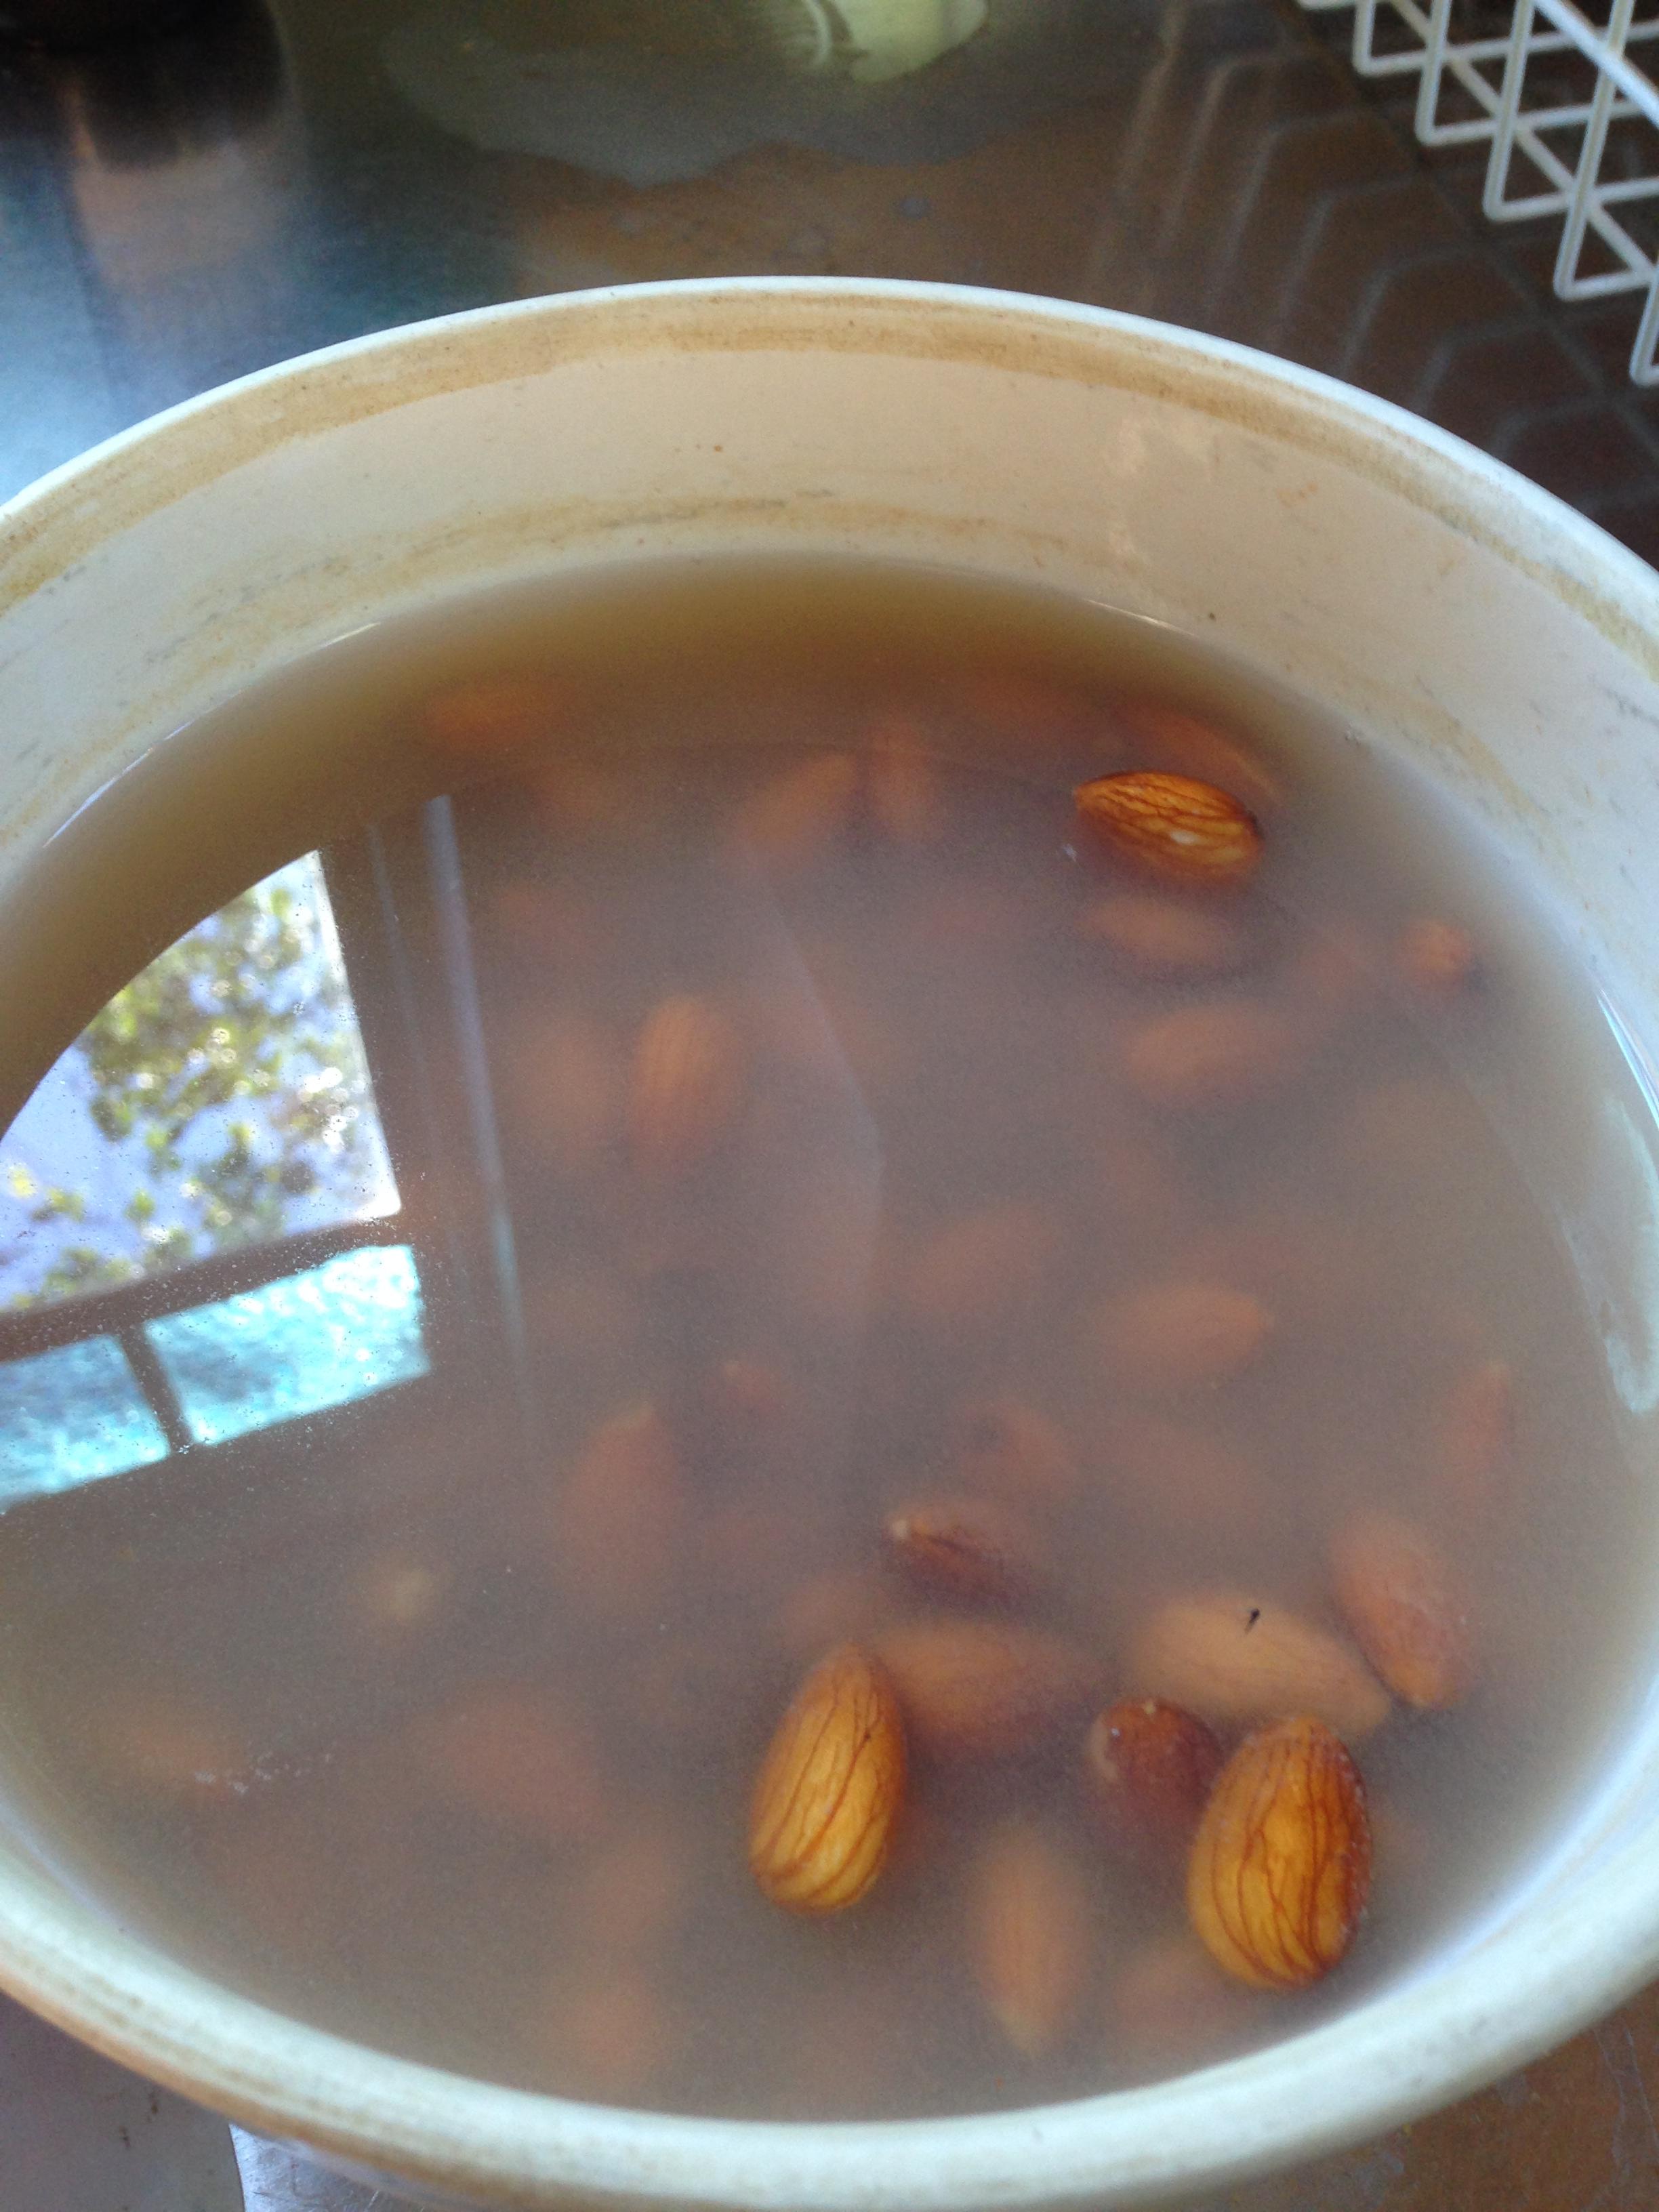 undermethylation recipe | Cauldrons and Cupcakes